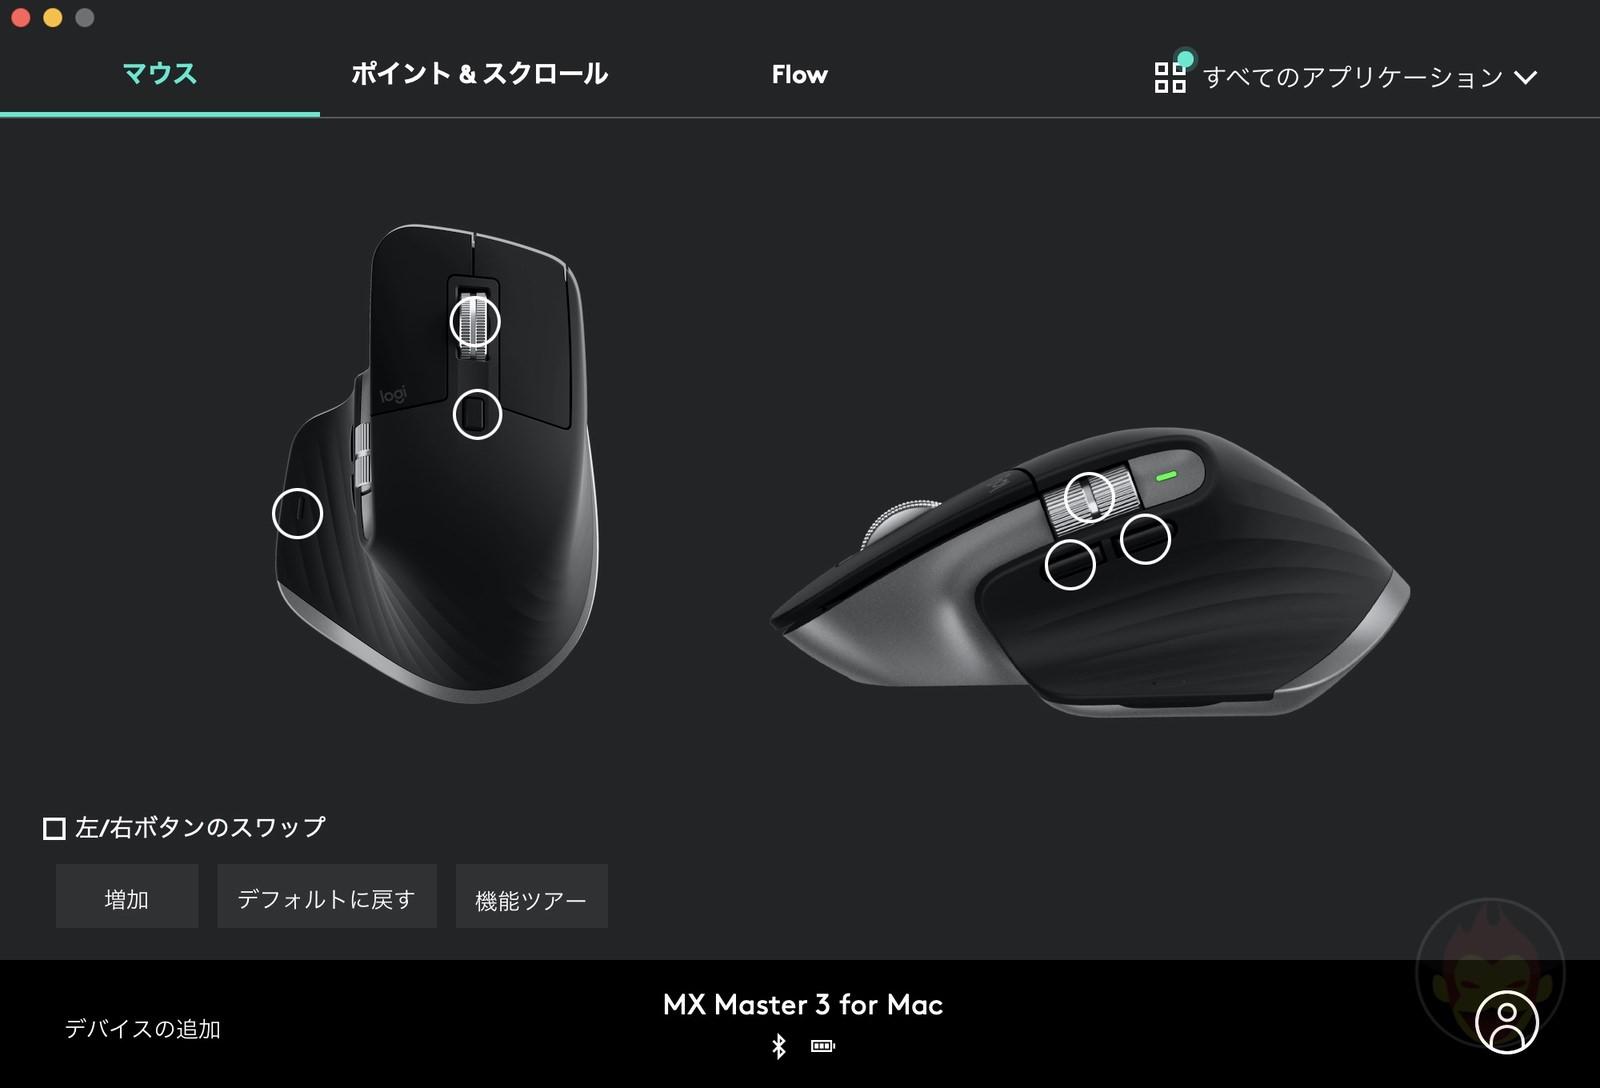 MX-Master-3-connection-trouble-m1-mac-fix-05.jpg